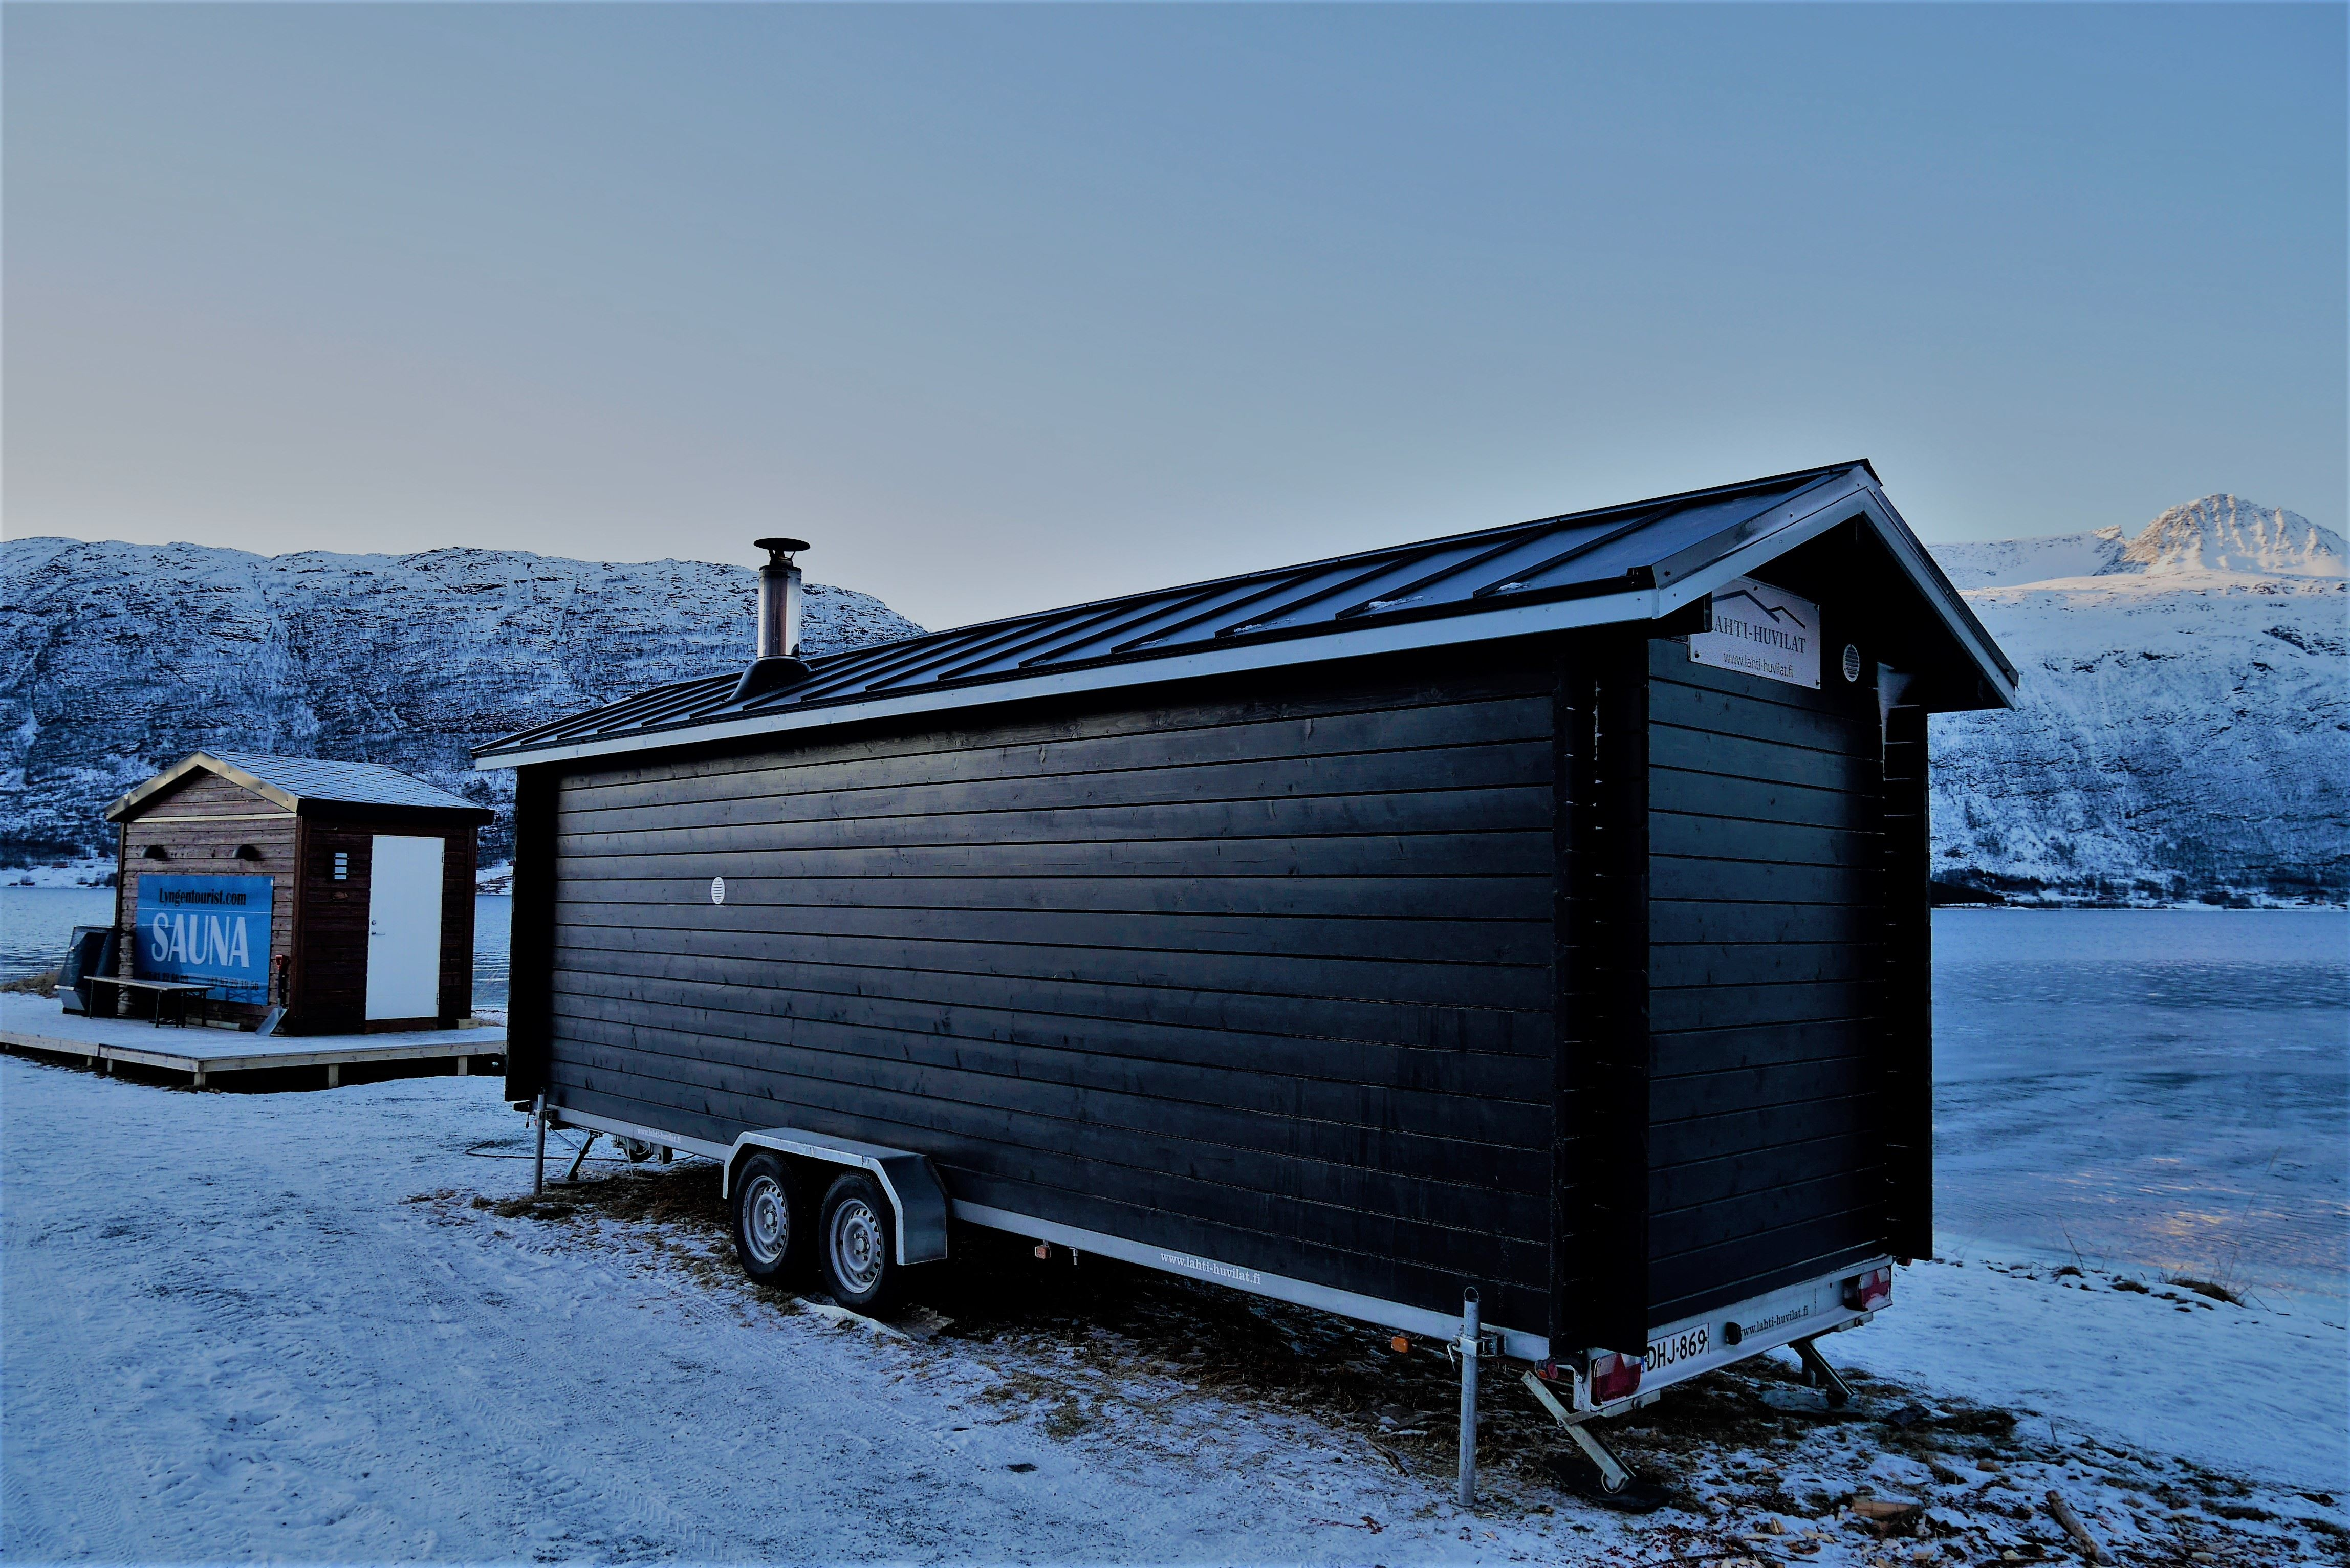 LyngenTourist - Arctic Swimming & Sauna